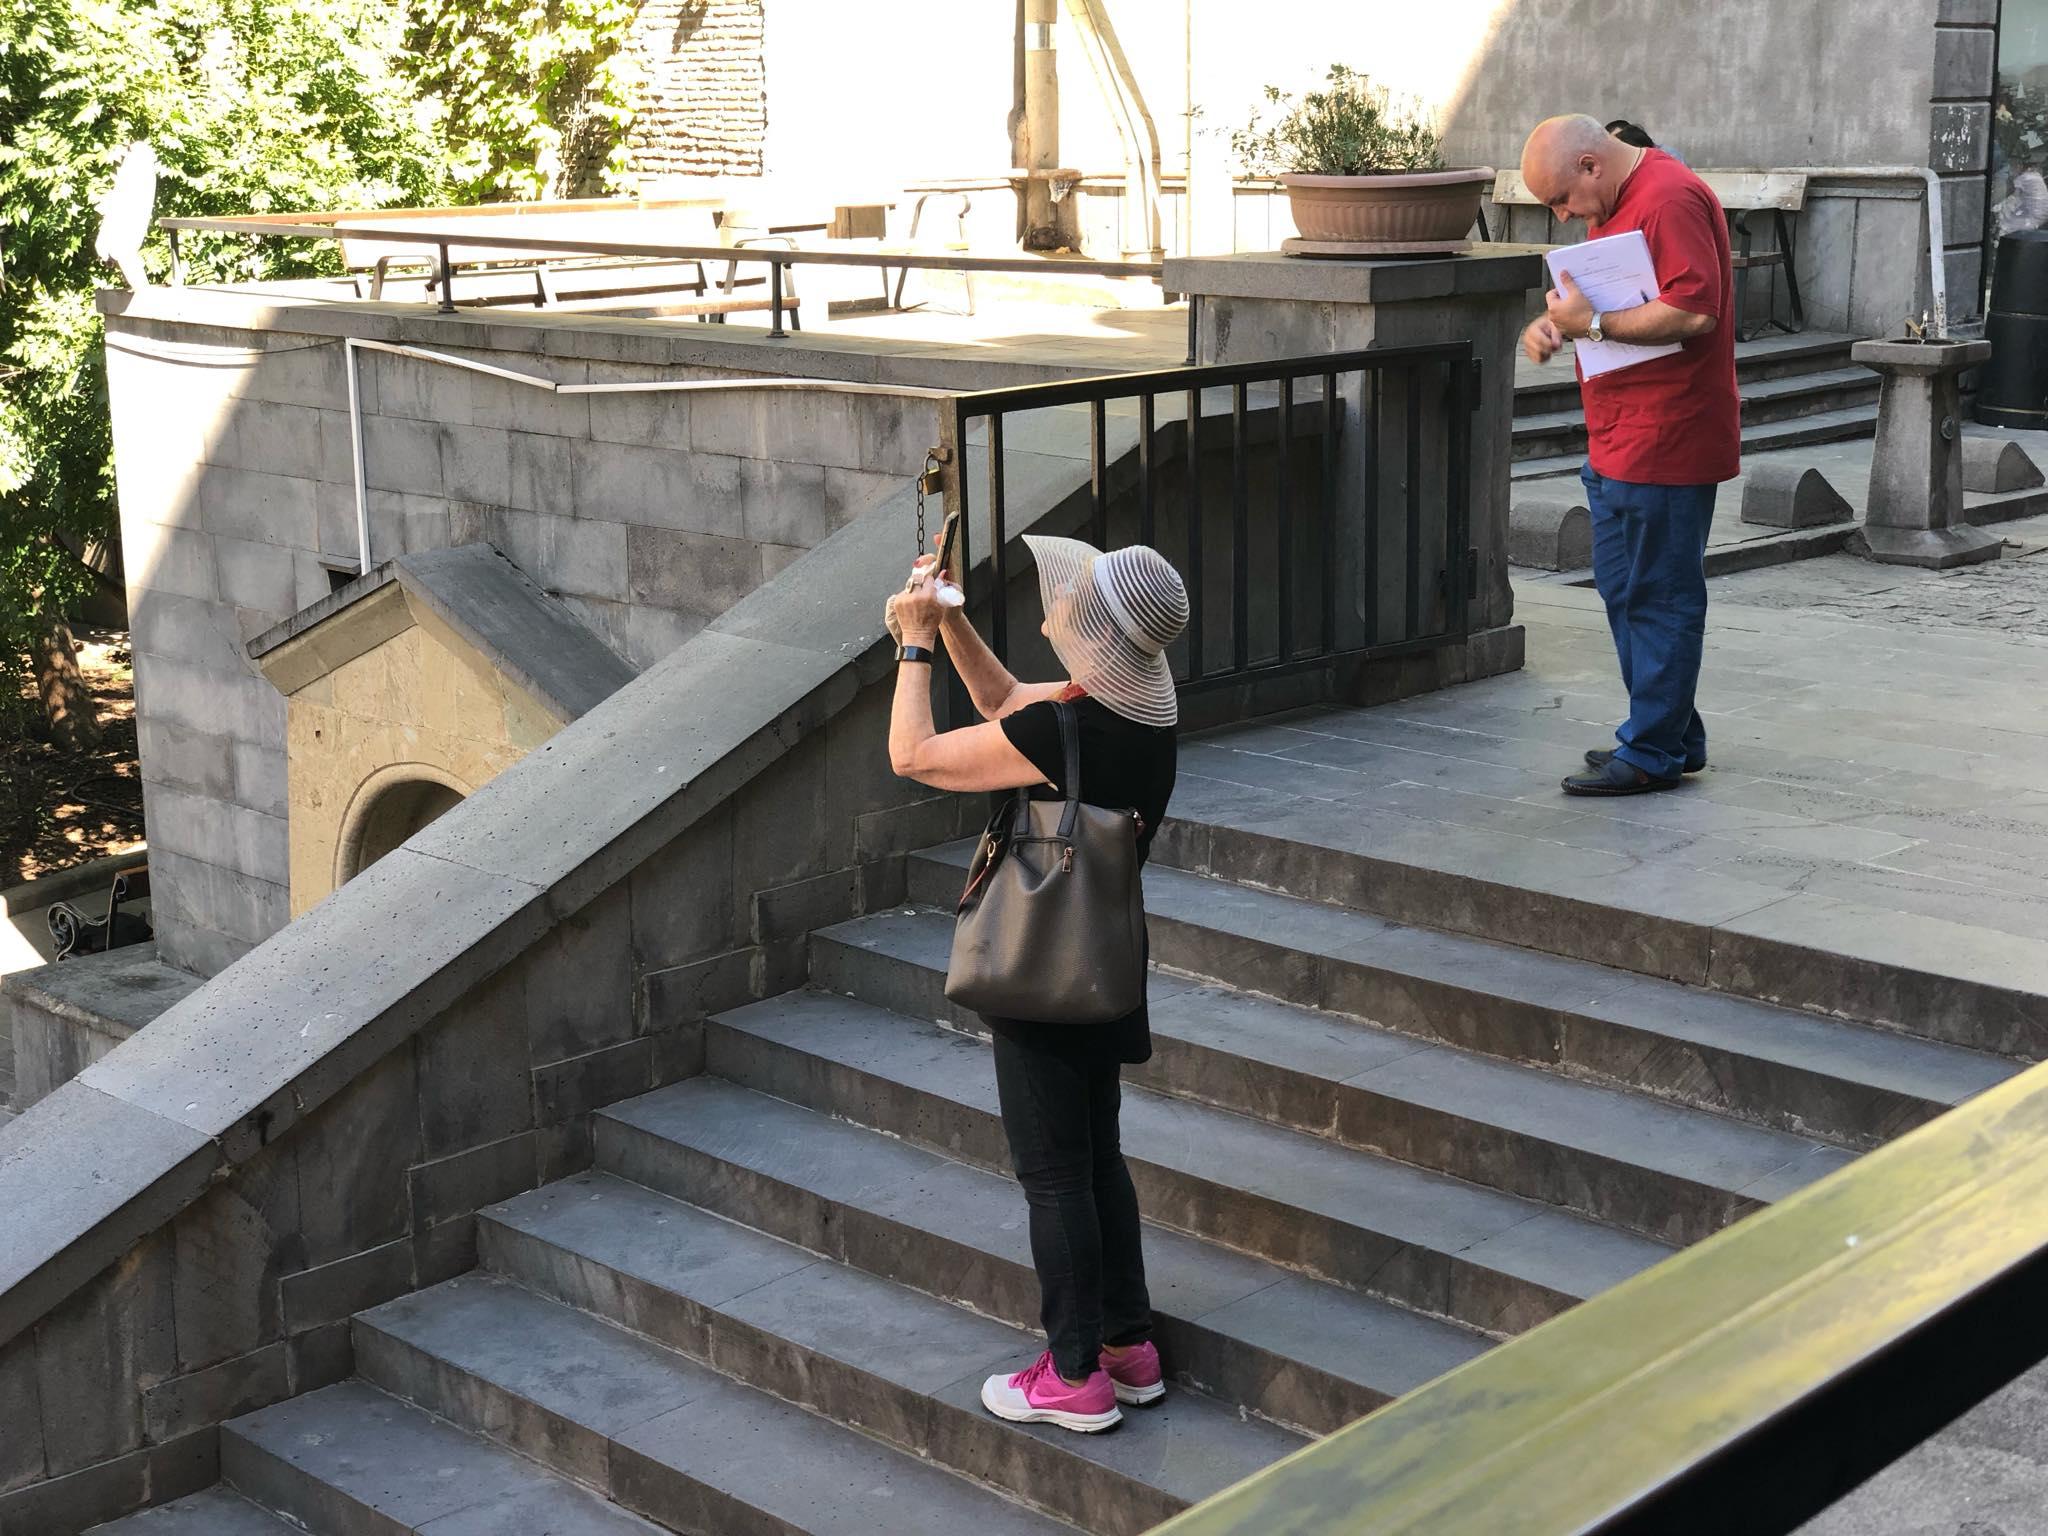 Tourism 2 #новости Covid-19, Национальная администрация туризма Грузии, туризм